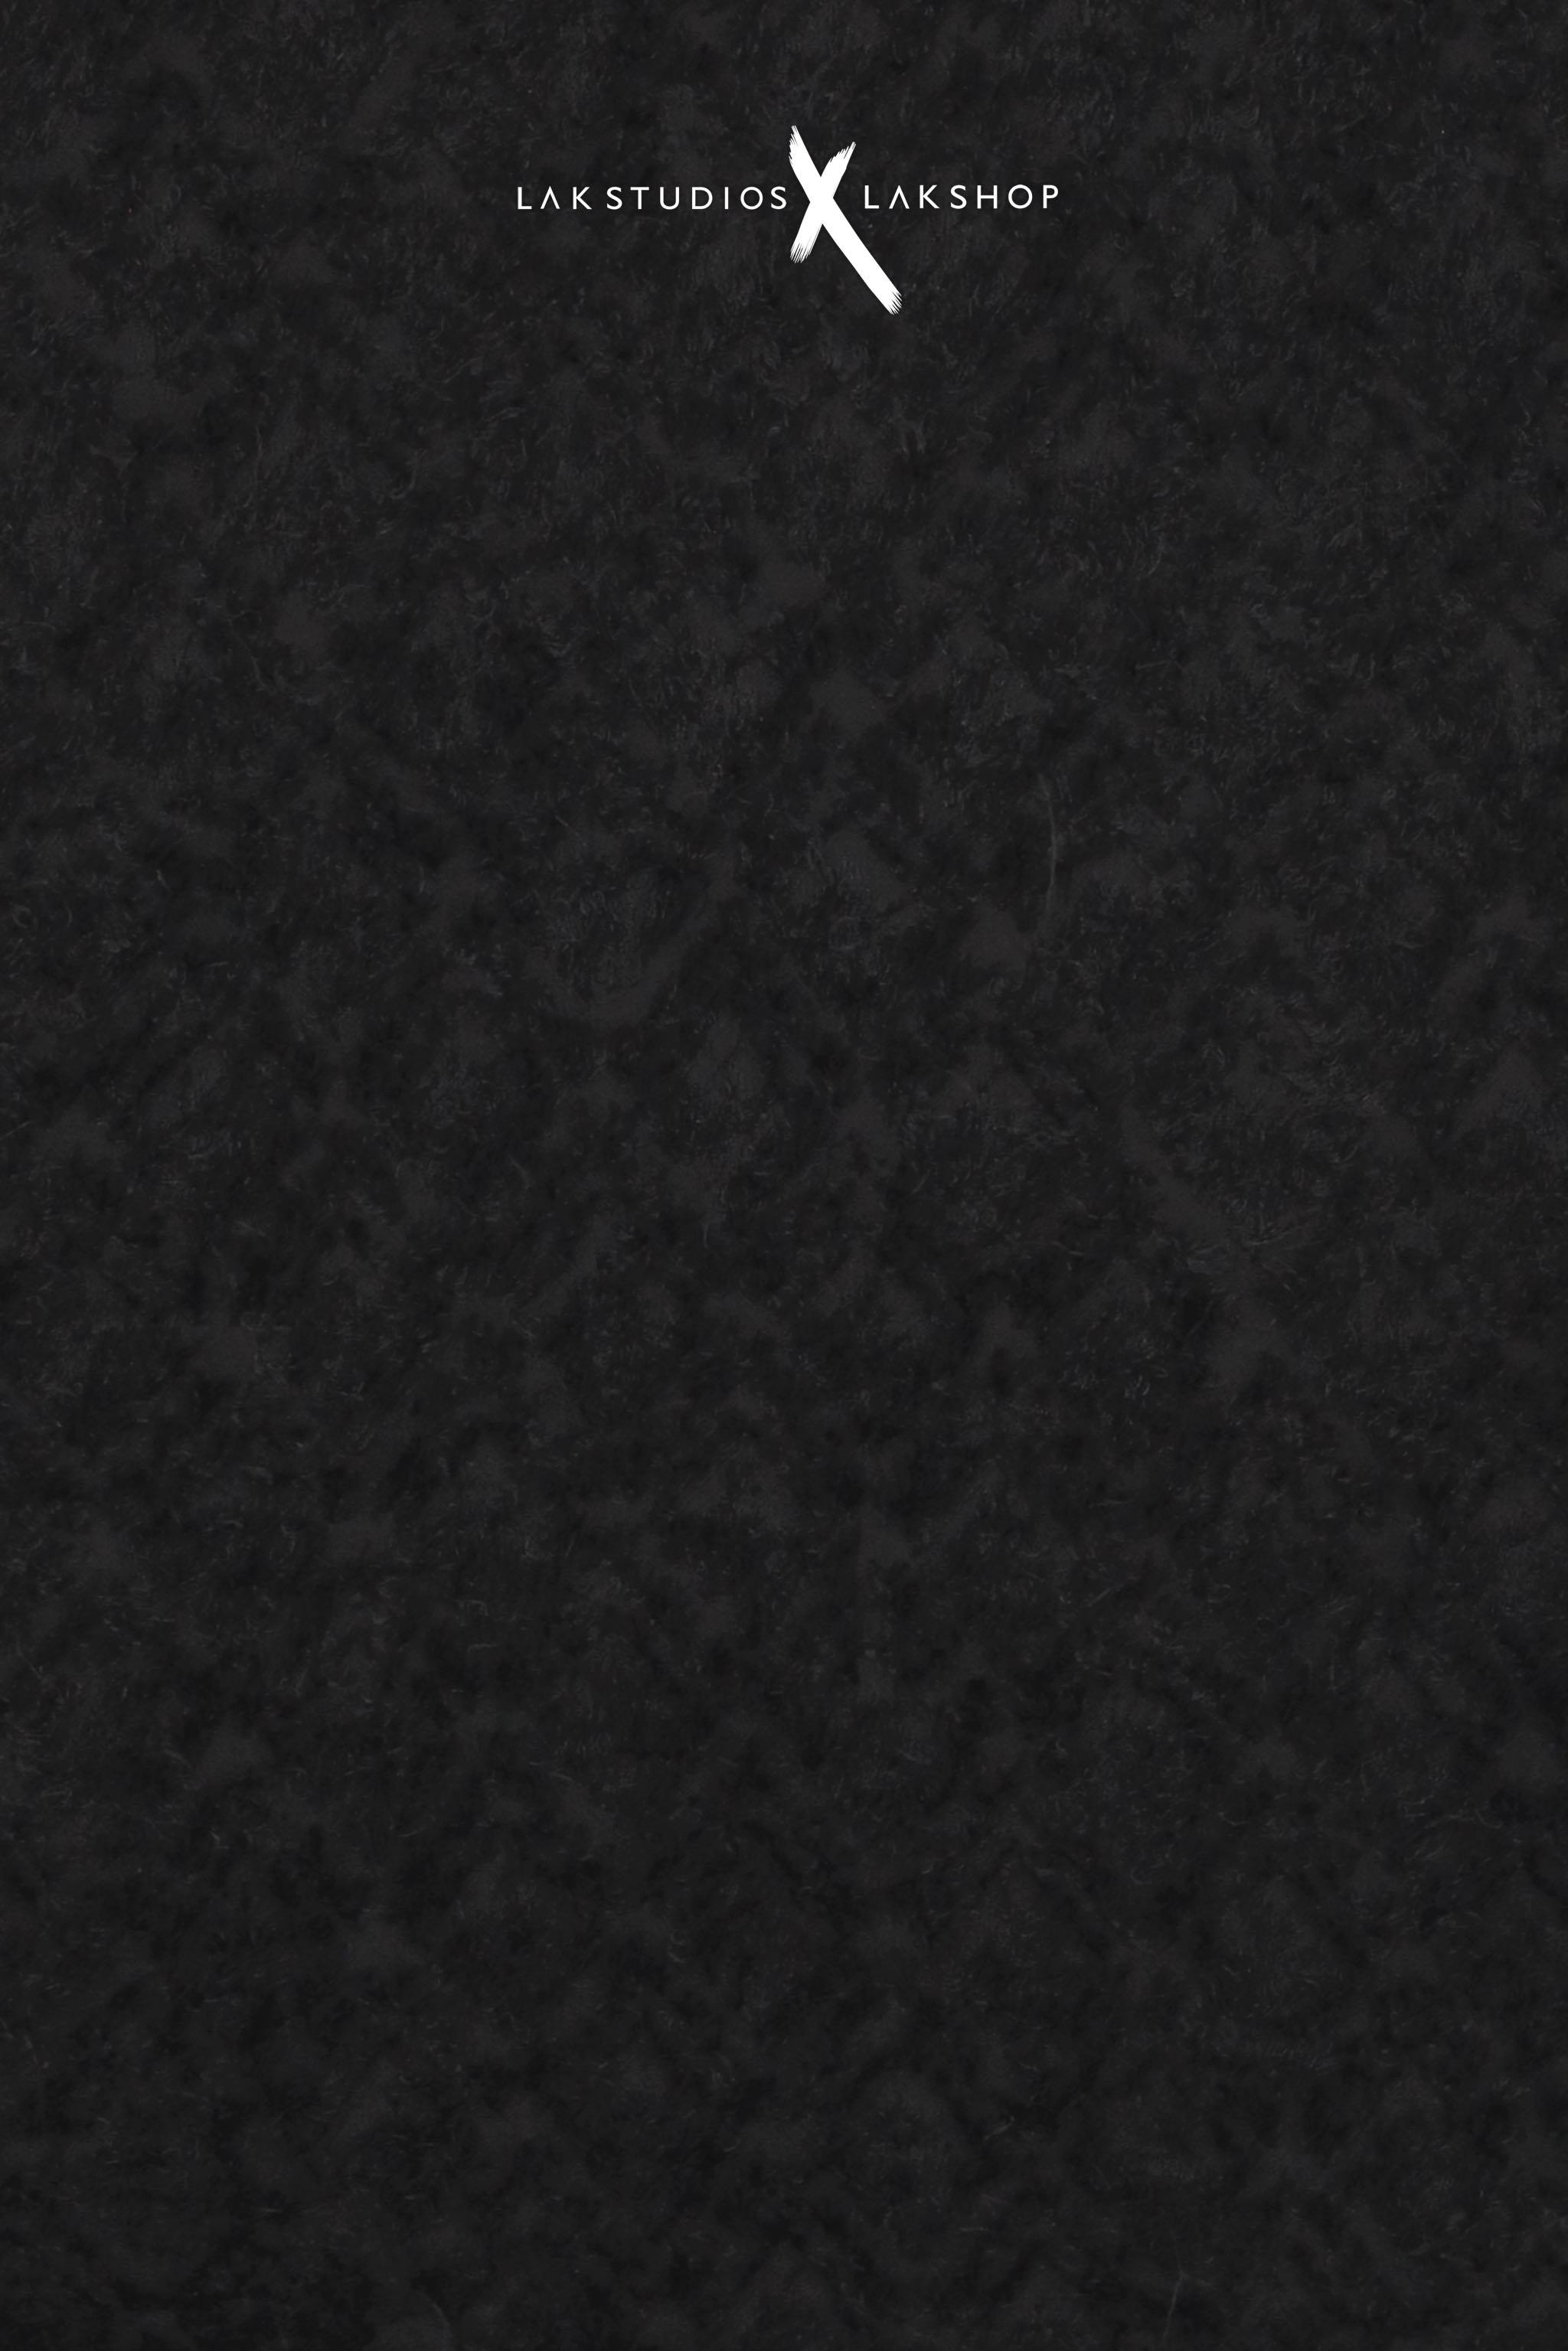 Lak Studios Check Tweed with Velvet Shirt Jacket